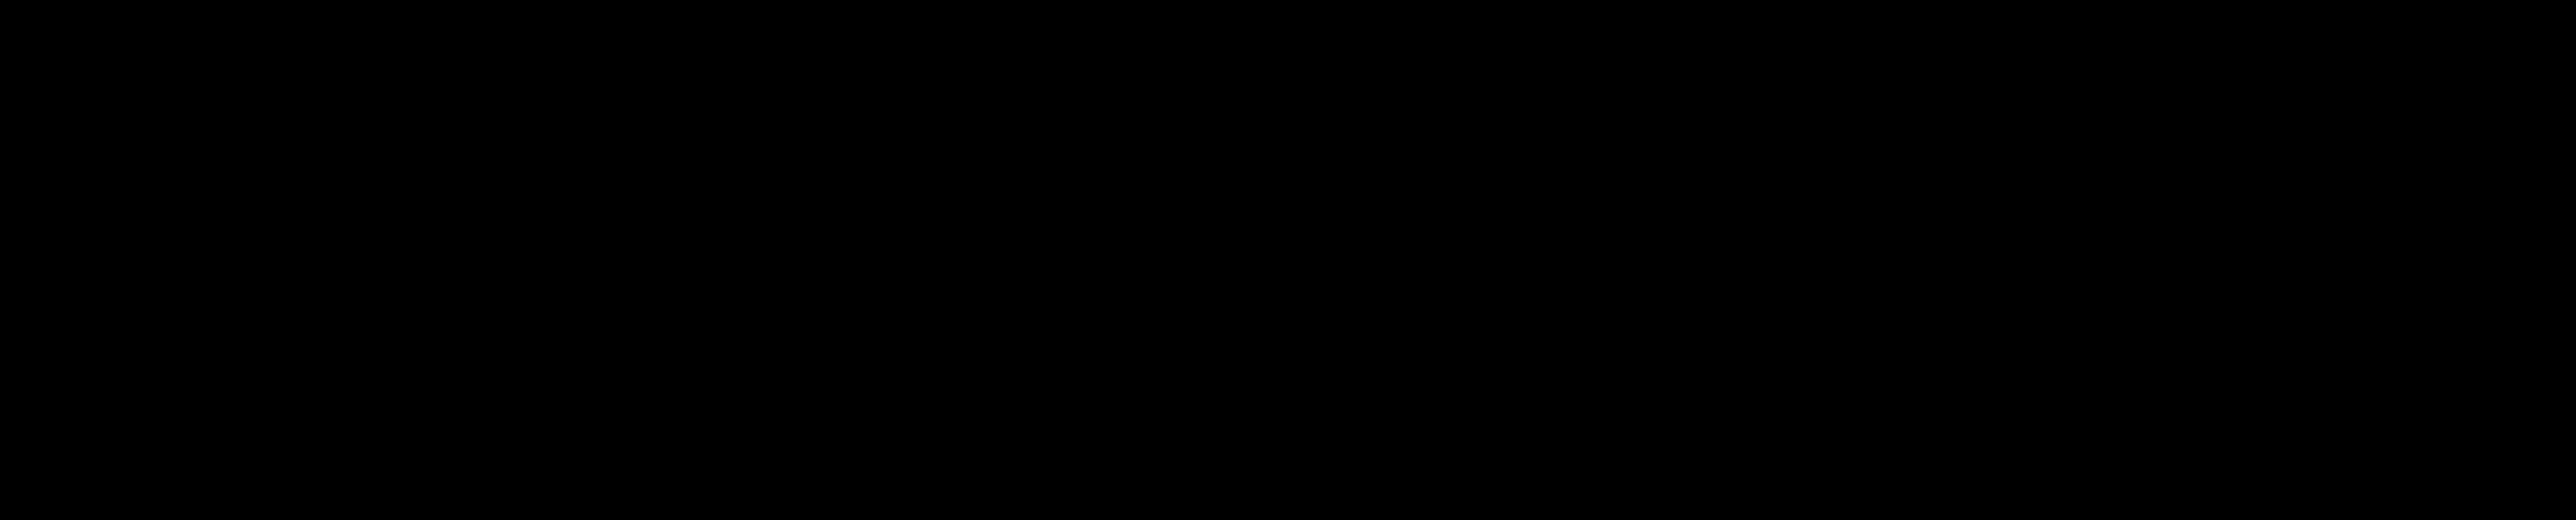 BLUSTERHOUSE